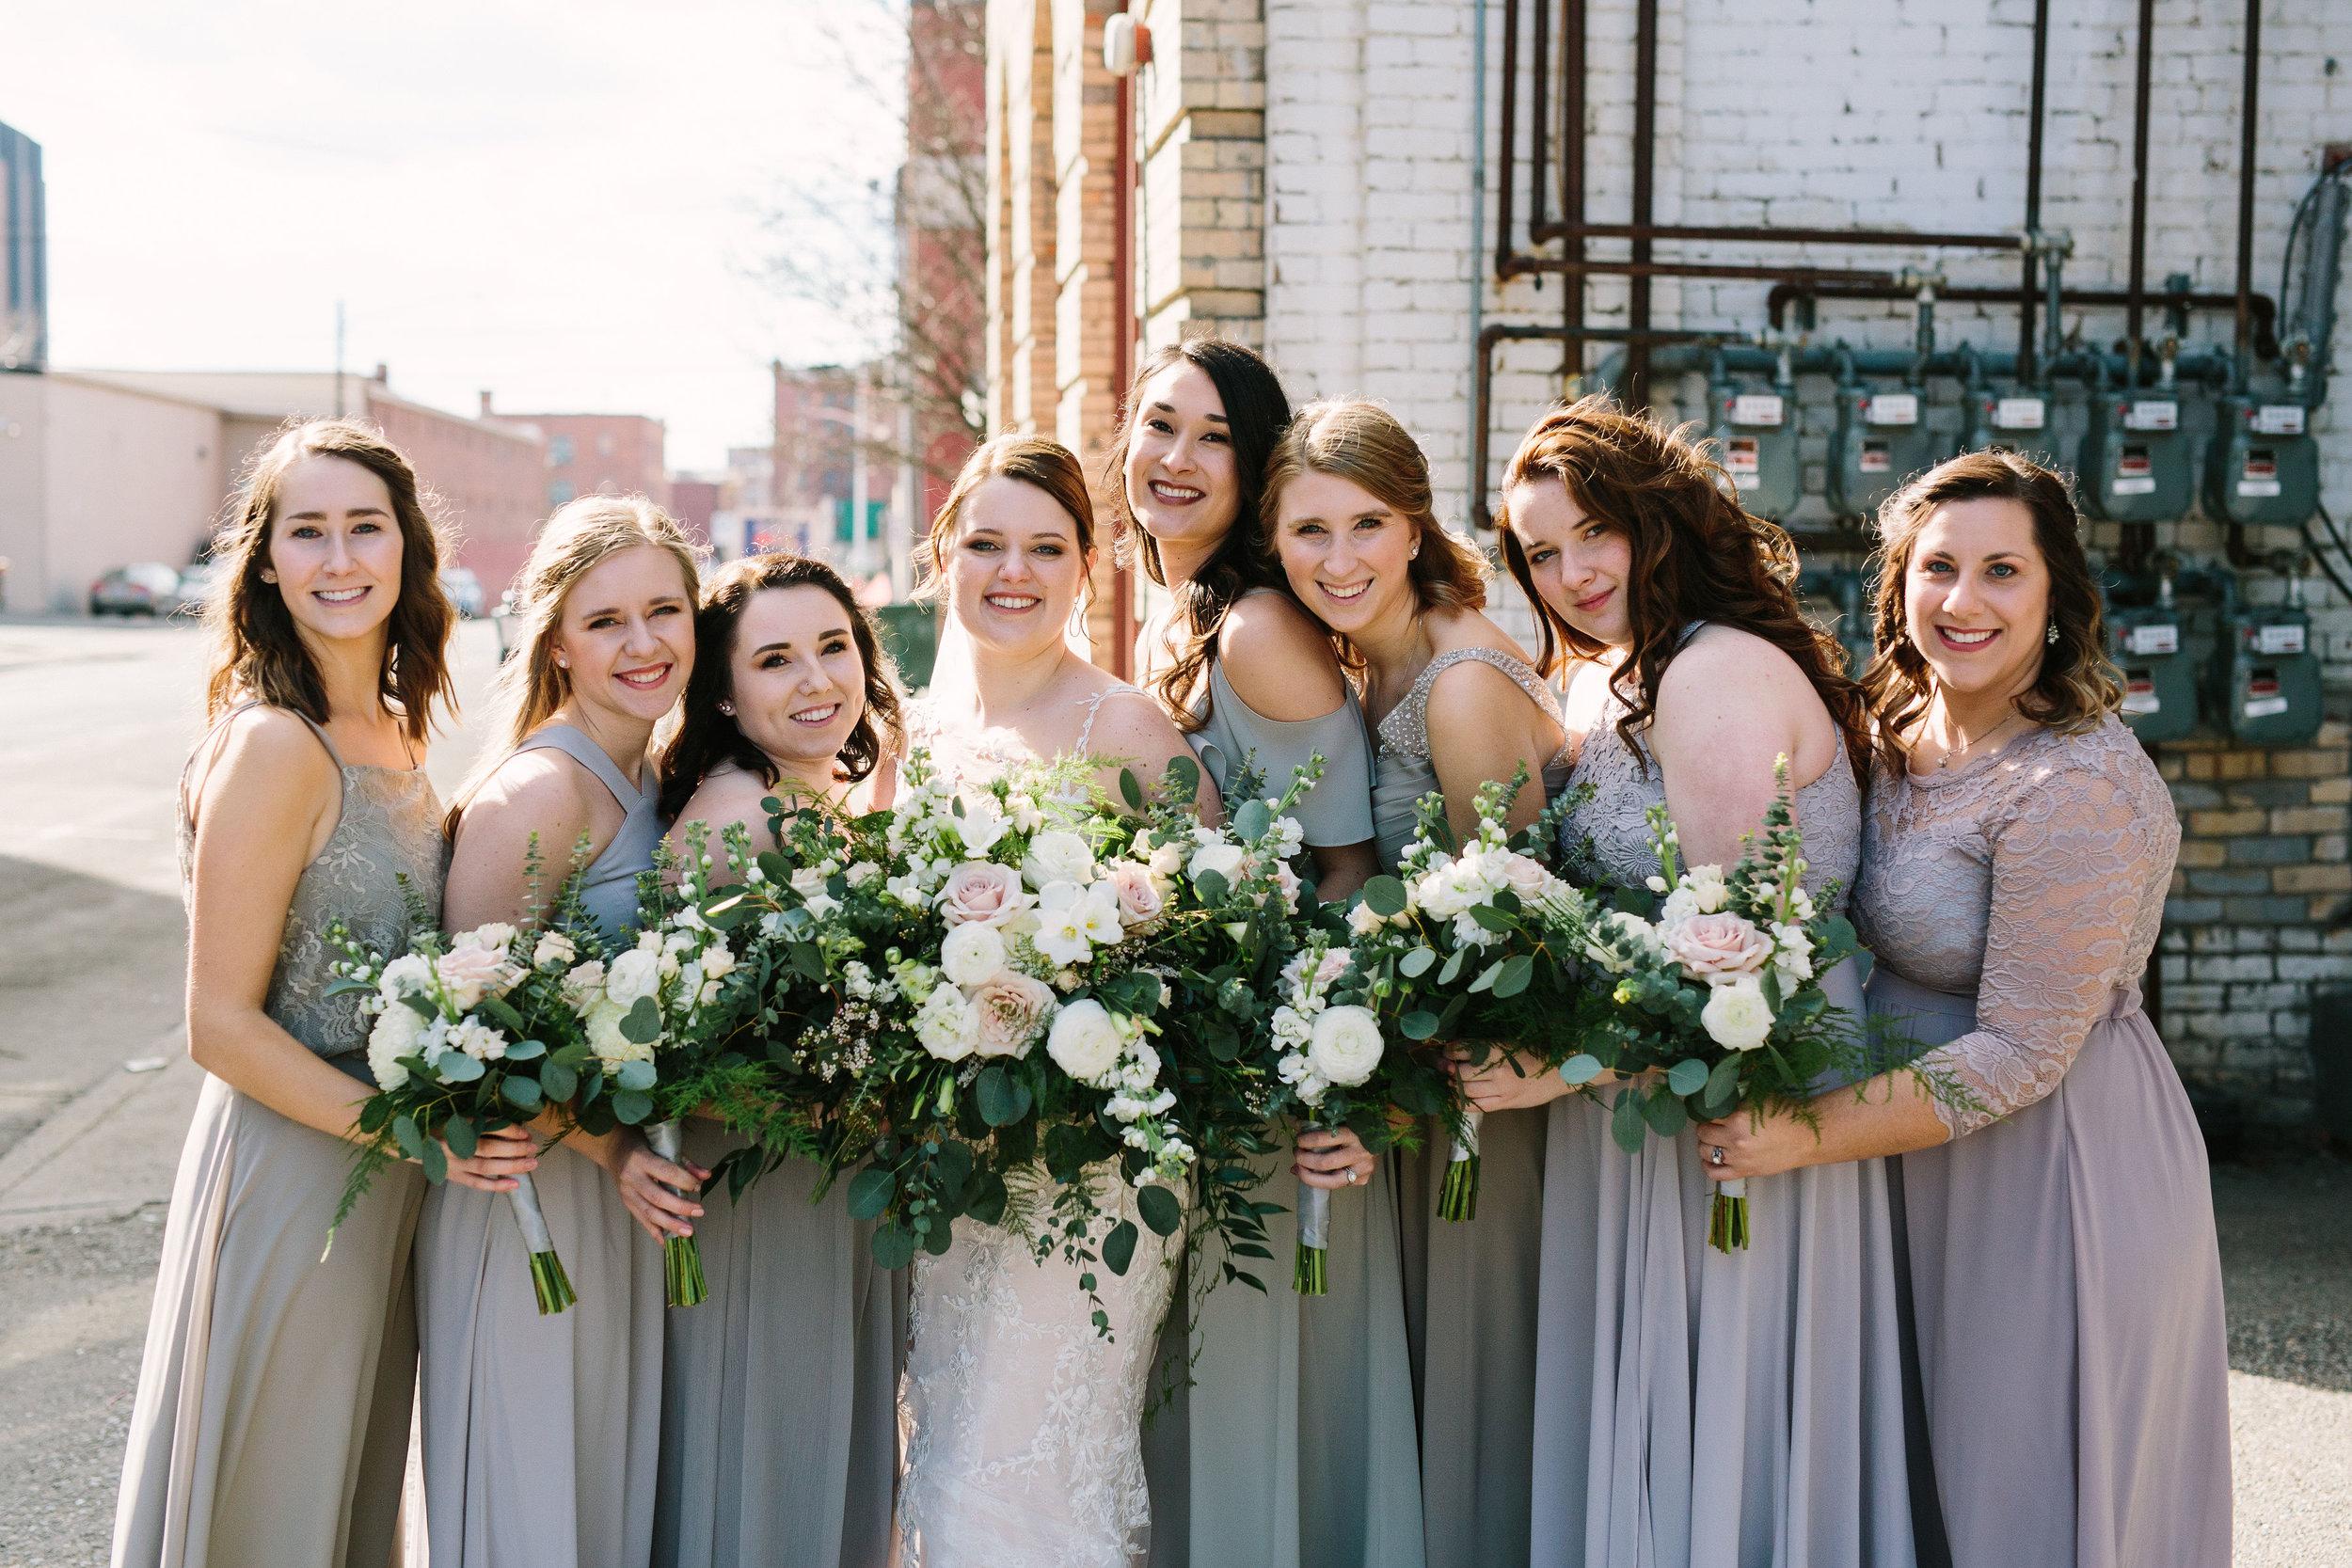 Fun Rustic spokane wedding bridesmaids together bride flower bouquets